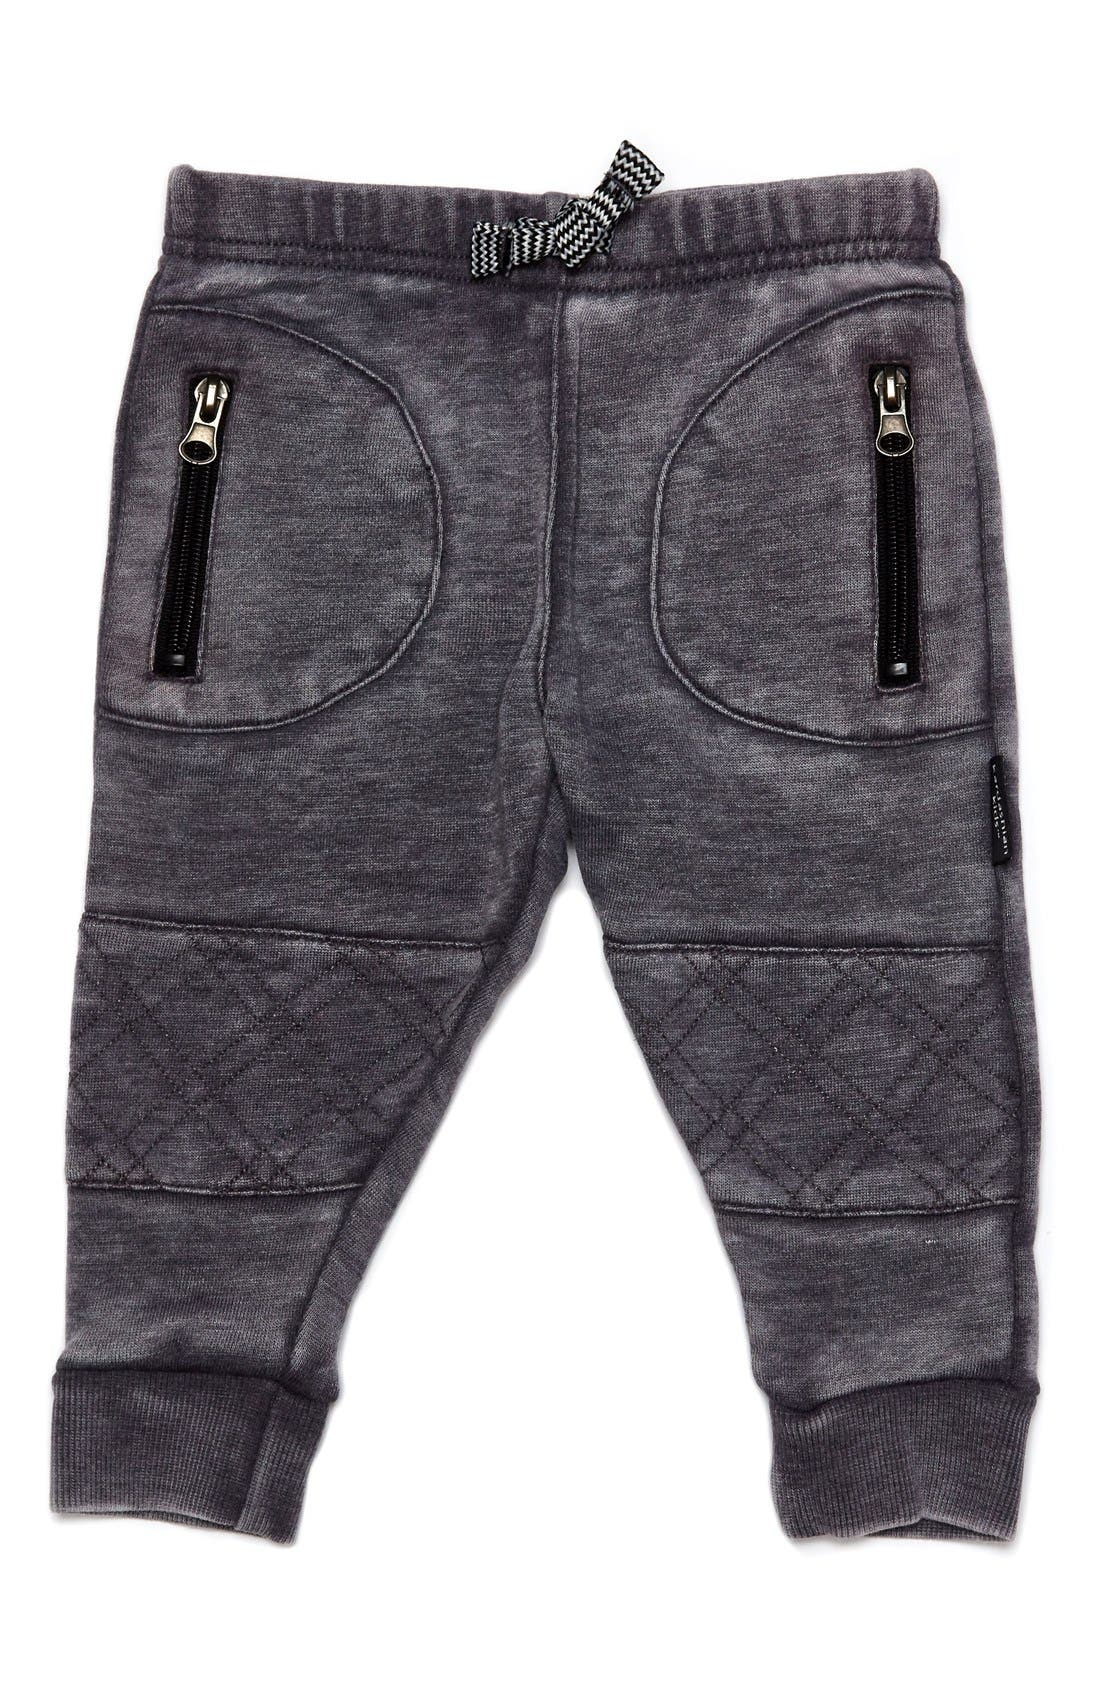 Main Image - Kardashian Kids Quilted Jogger Pants (Toddler Boys & Little Boys)